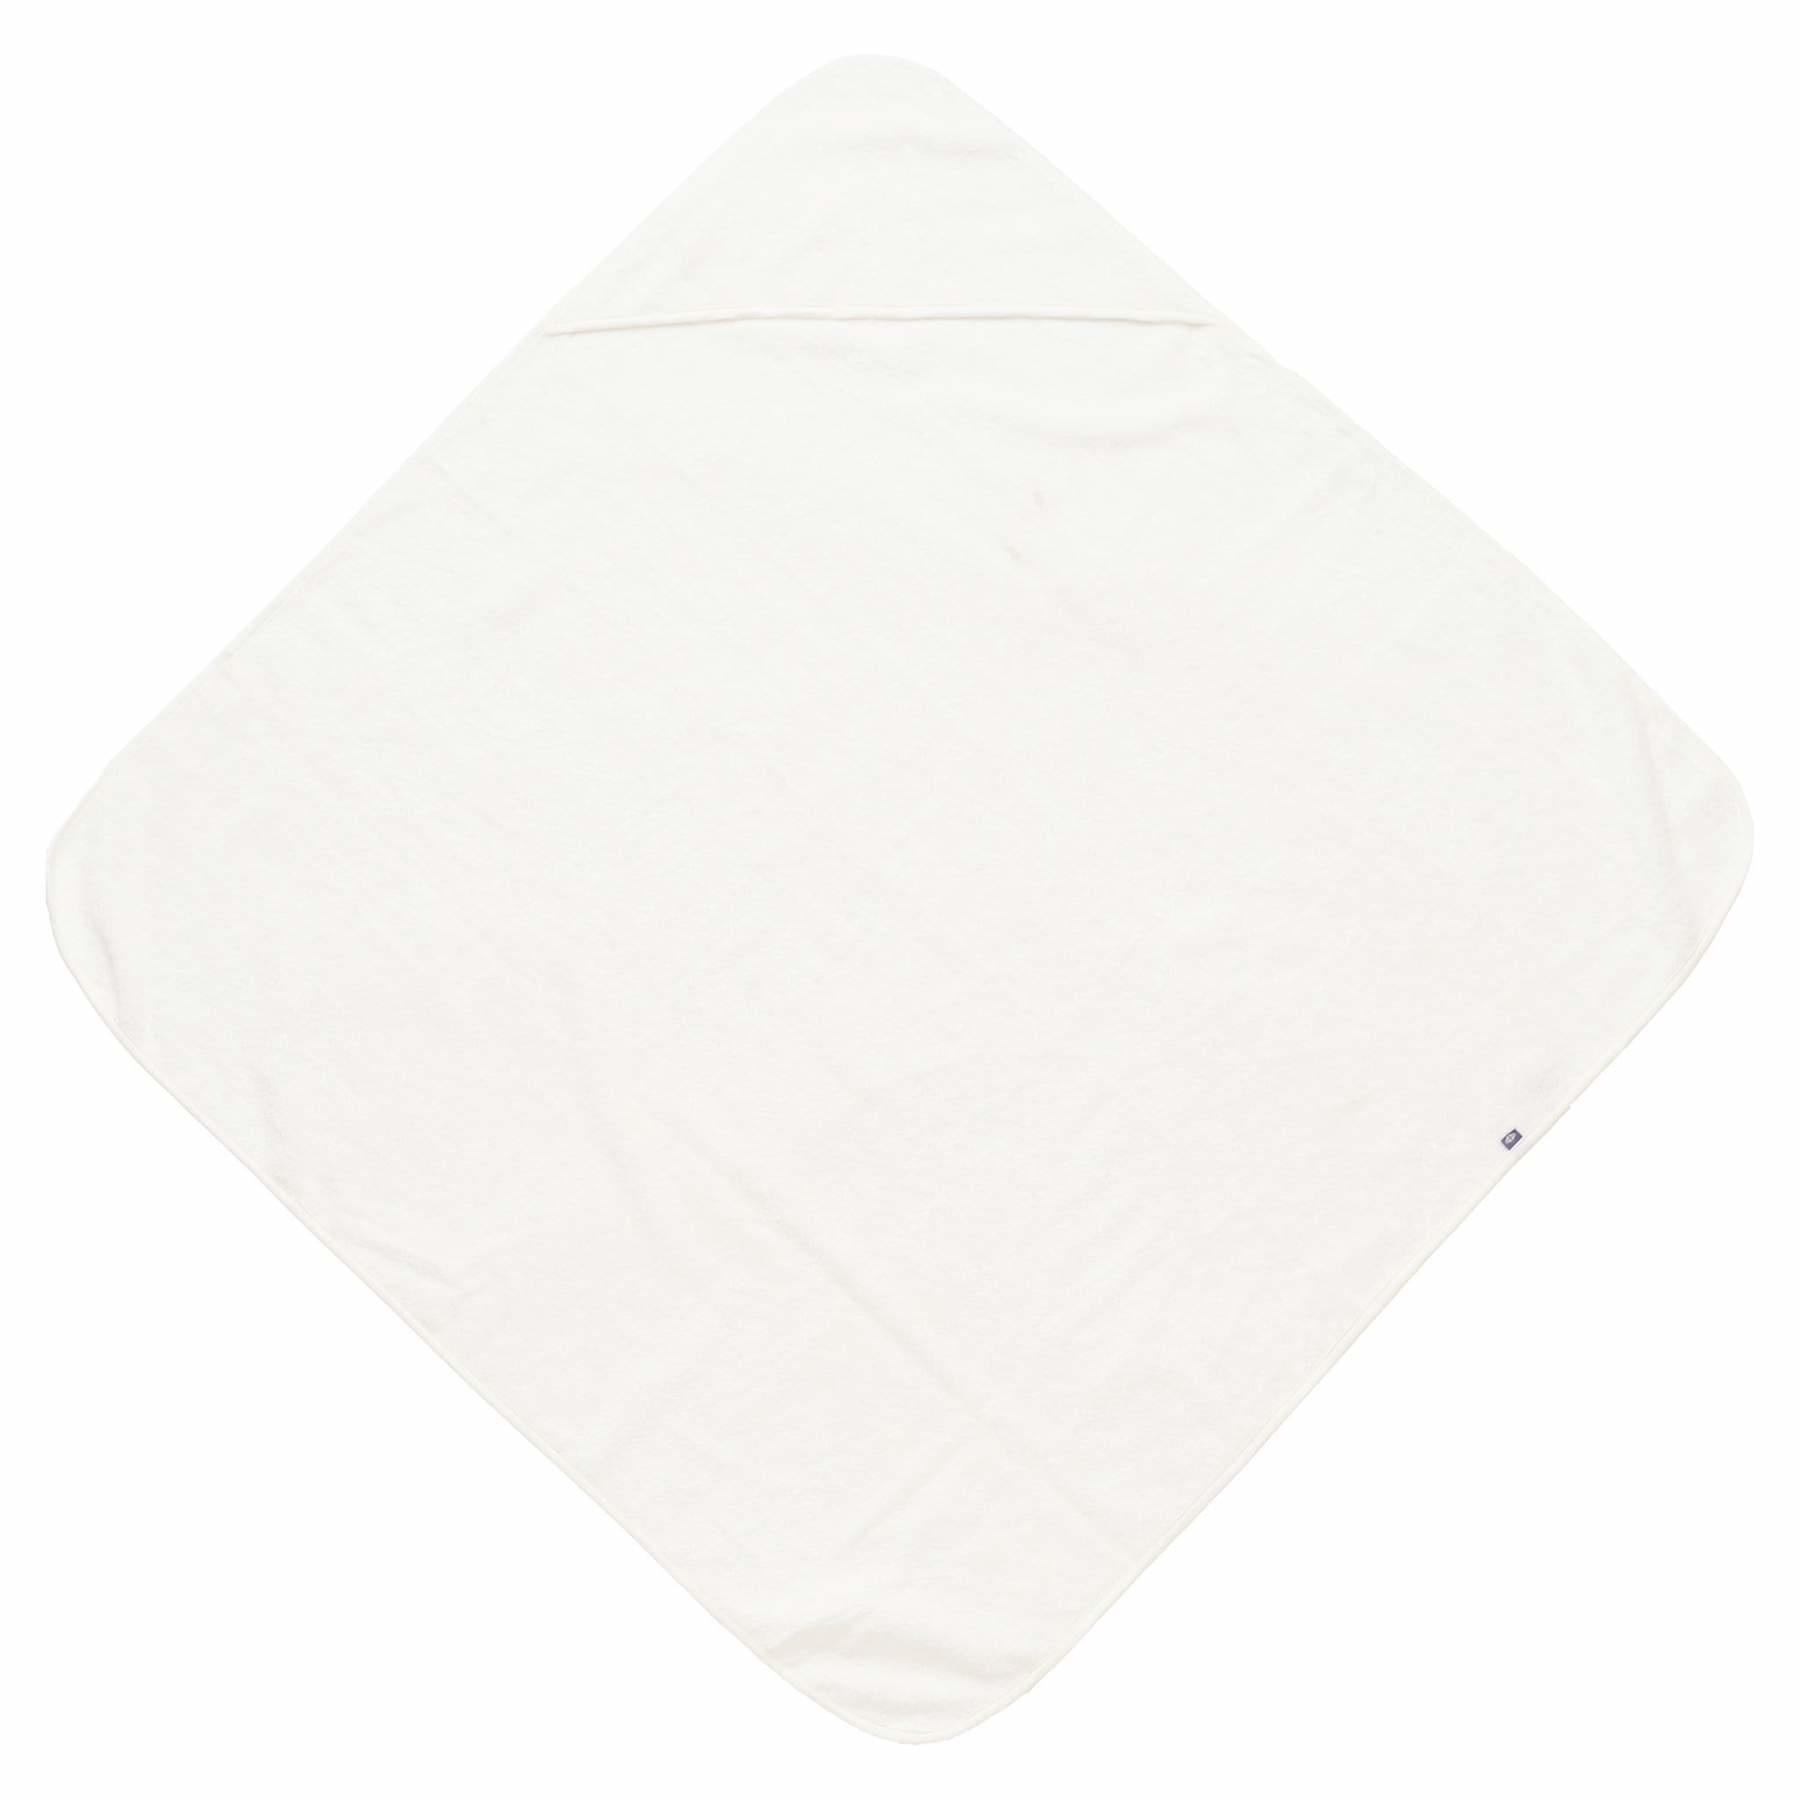 Kyte Baby Kyte Bamboo Hooded Bath Towel